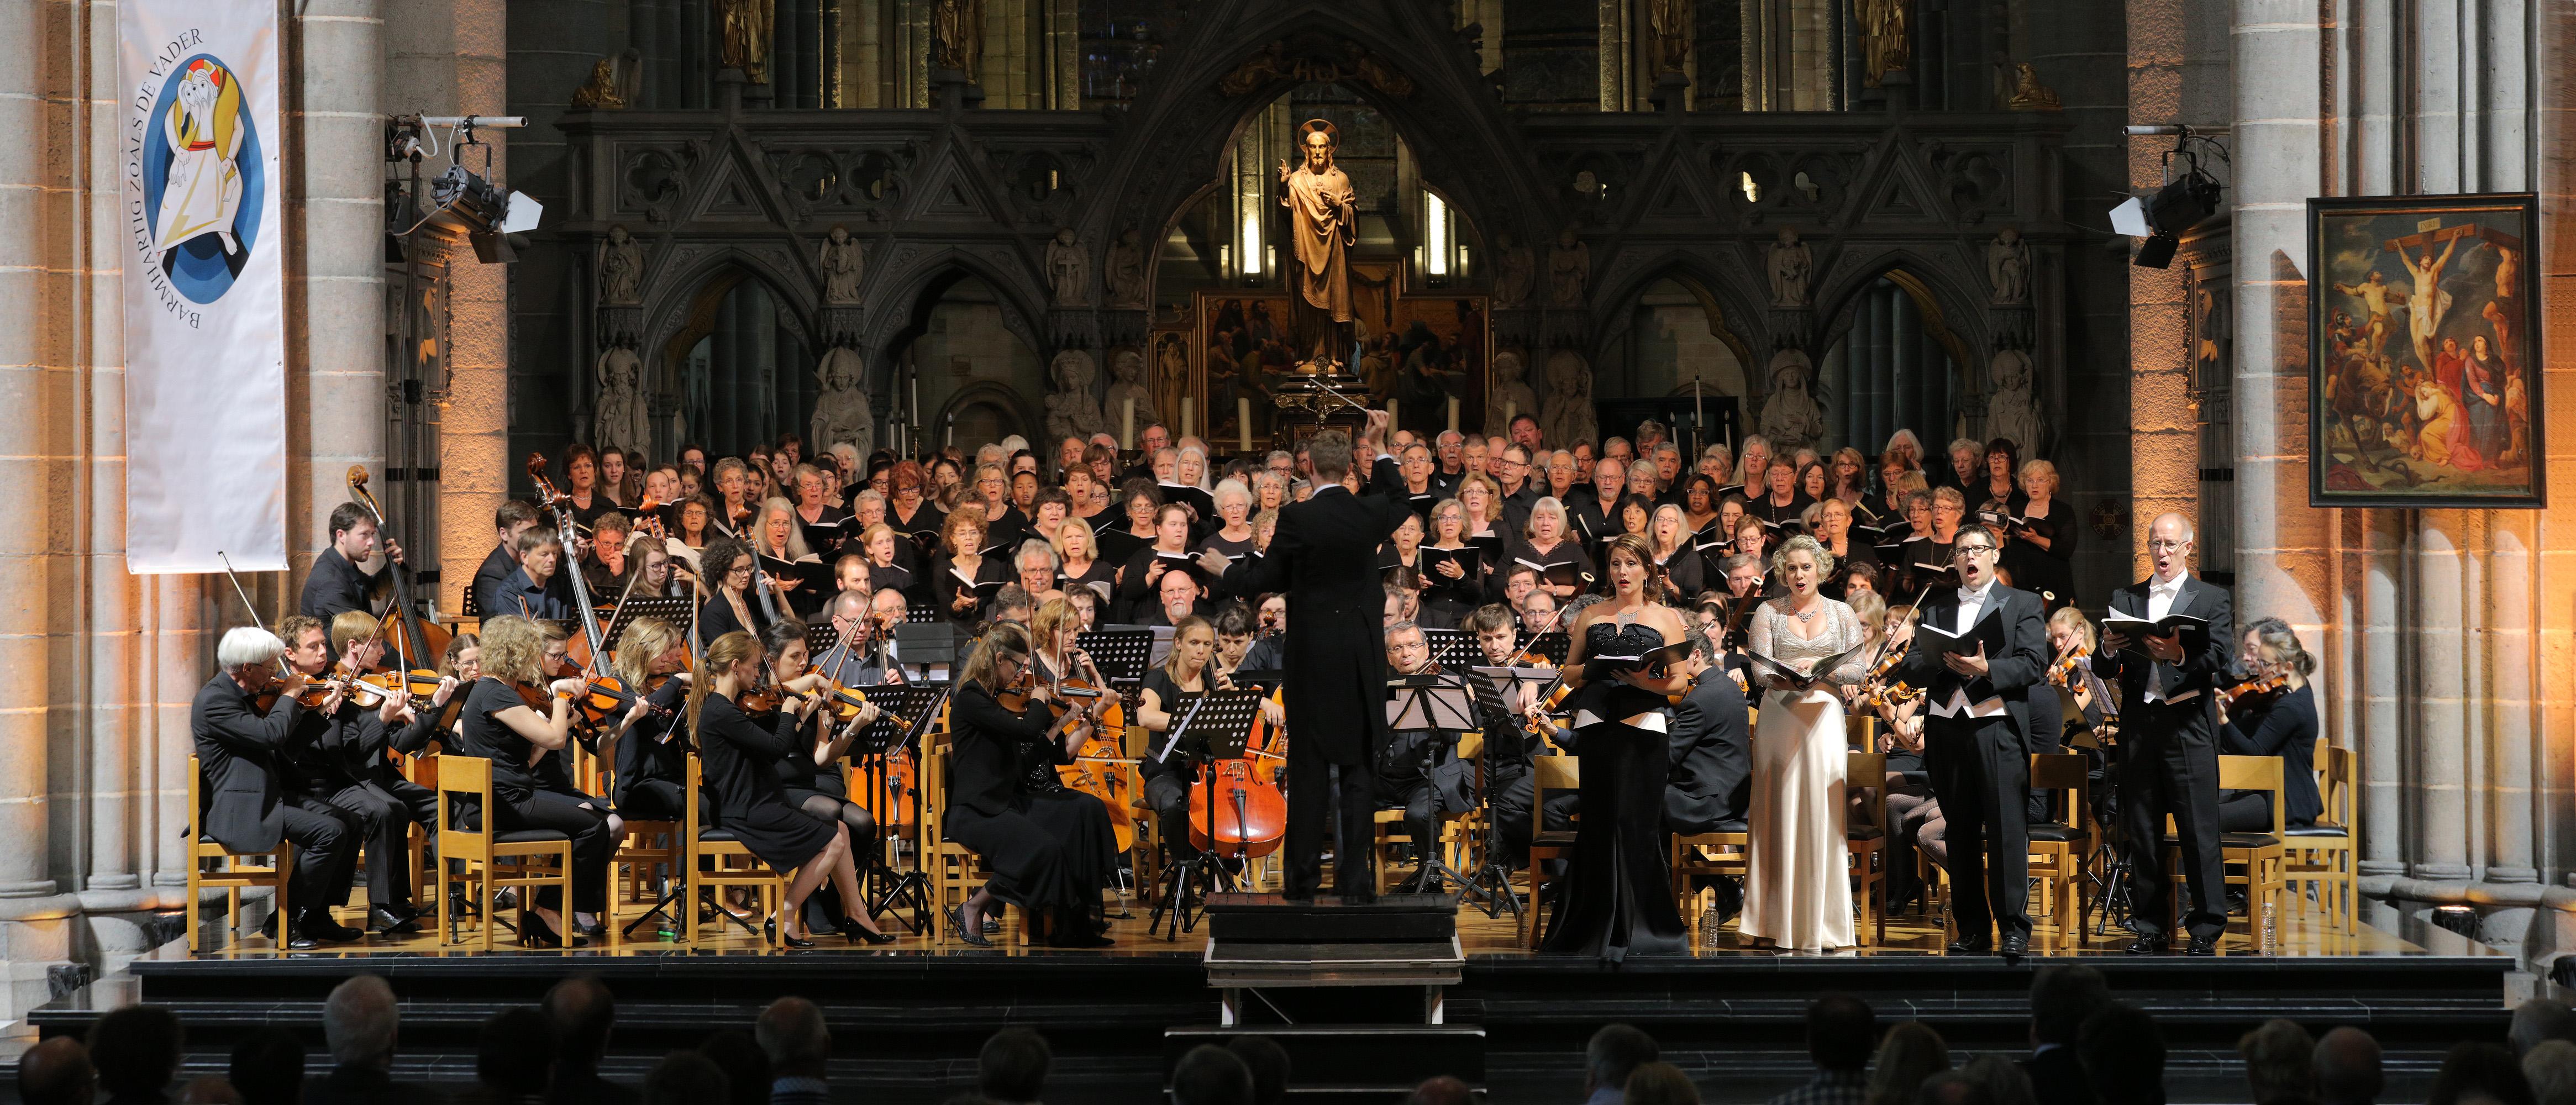 e16-ypresperformancepanA St. Martin's Cathedral,  Ypres, Belgium, 2016